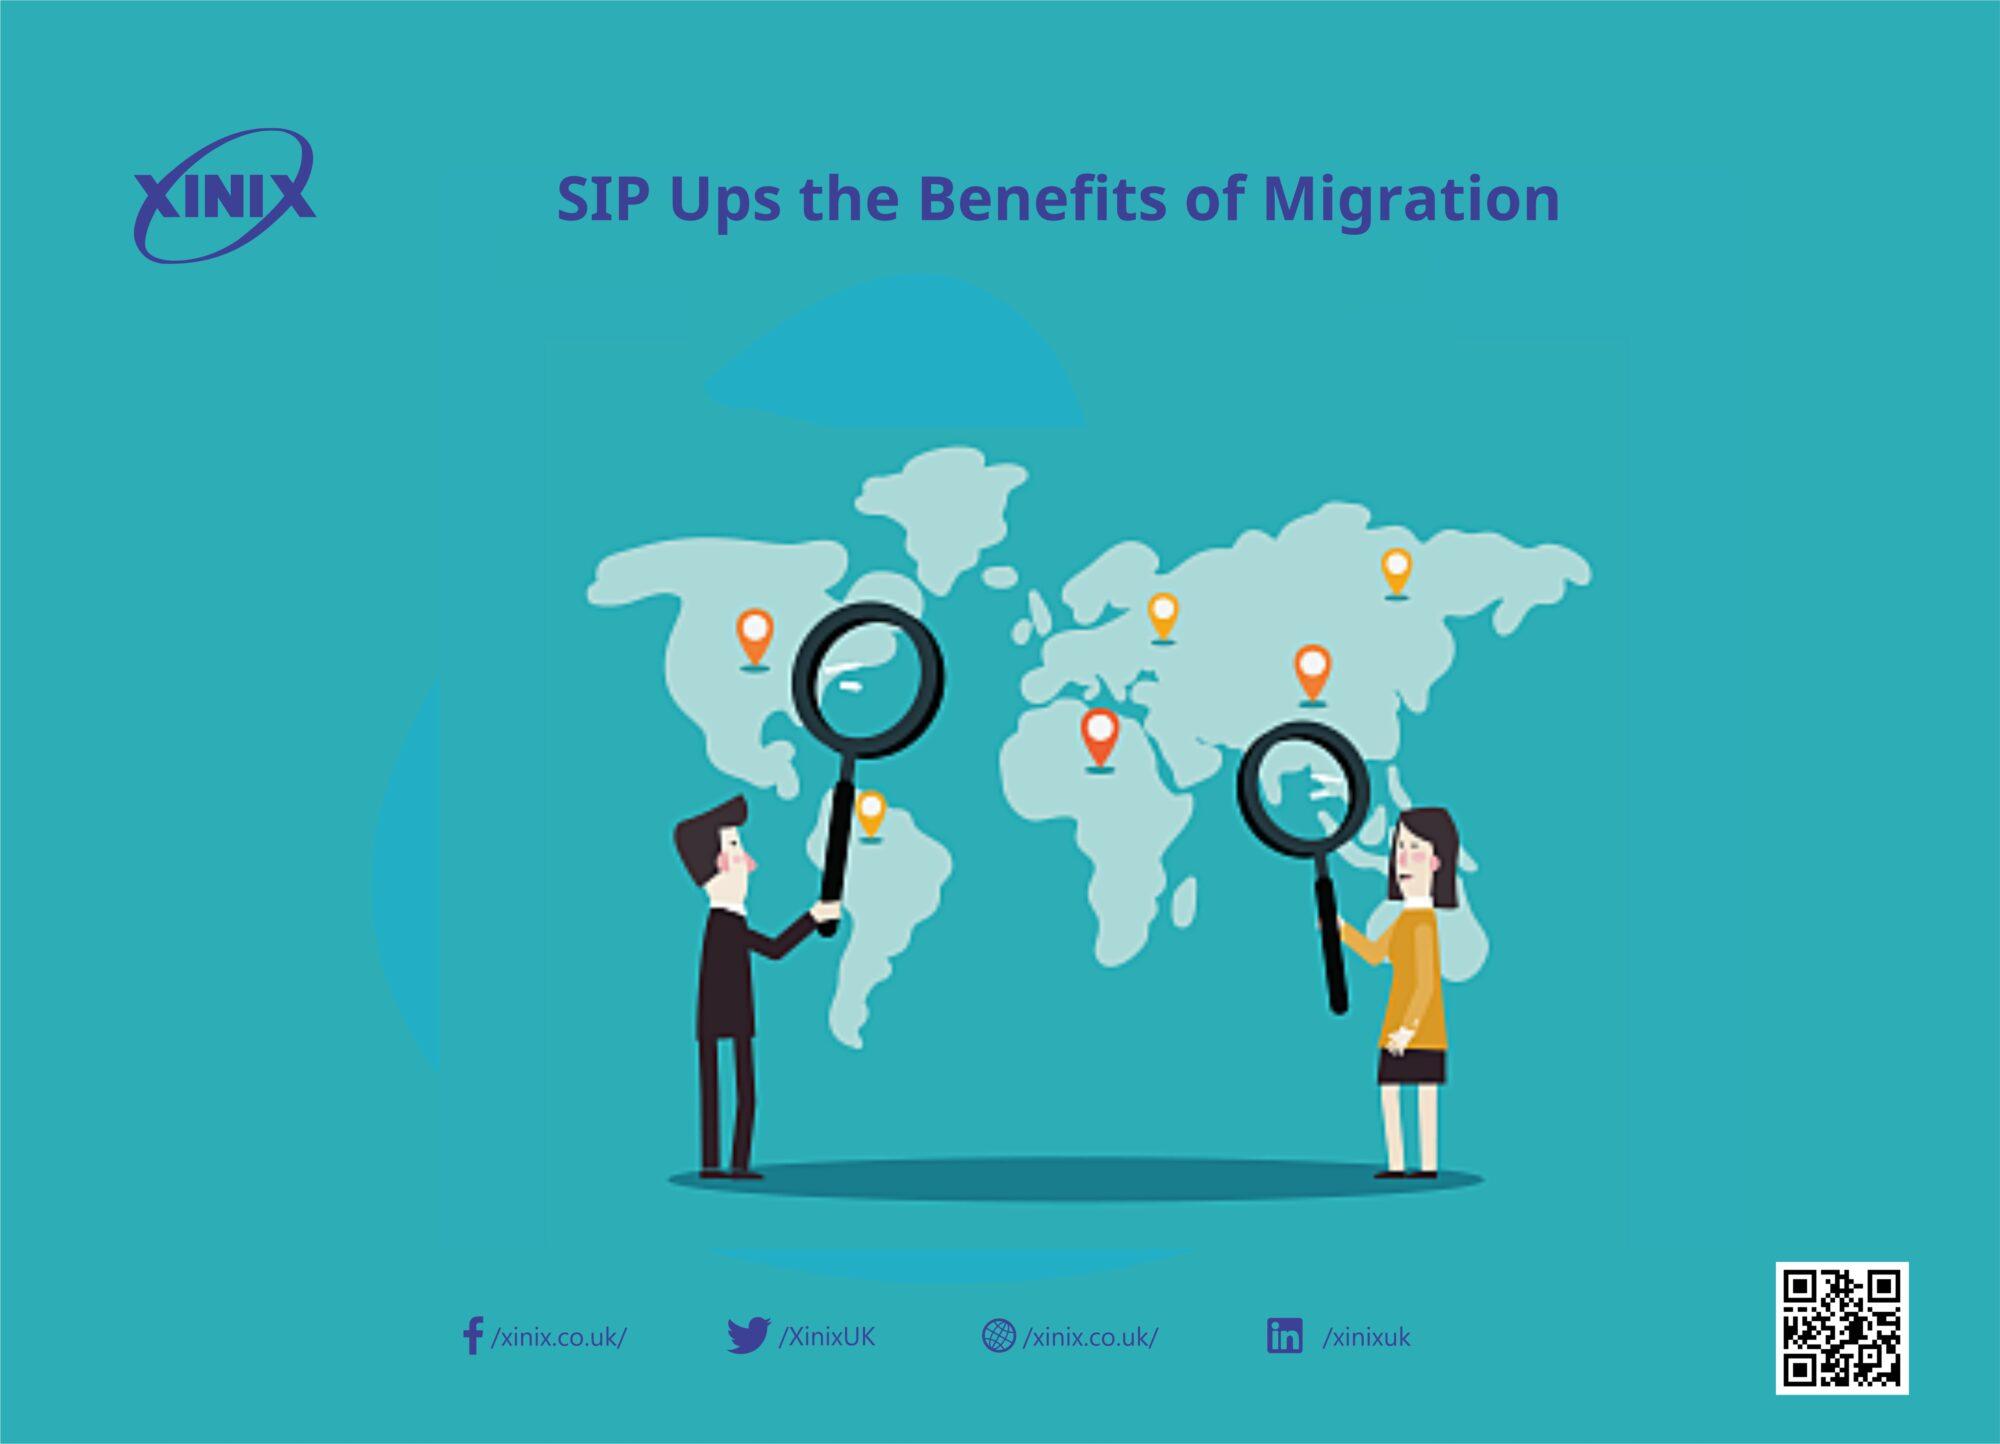 SIP Ups the Benefits of Migration